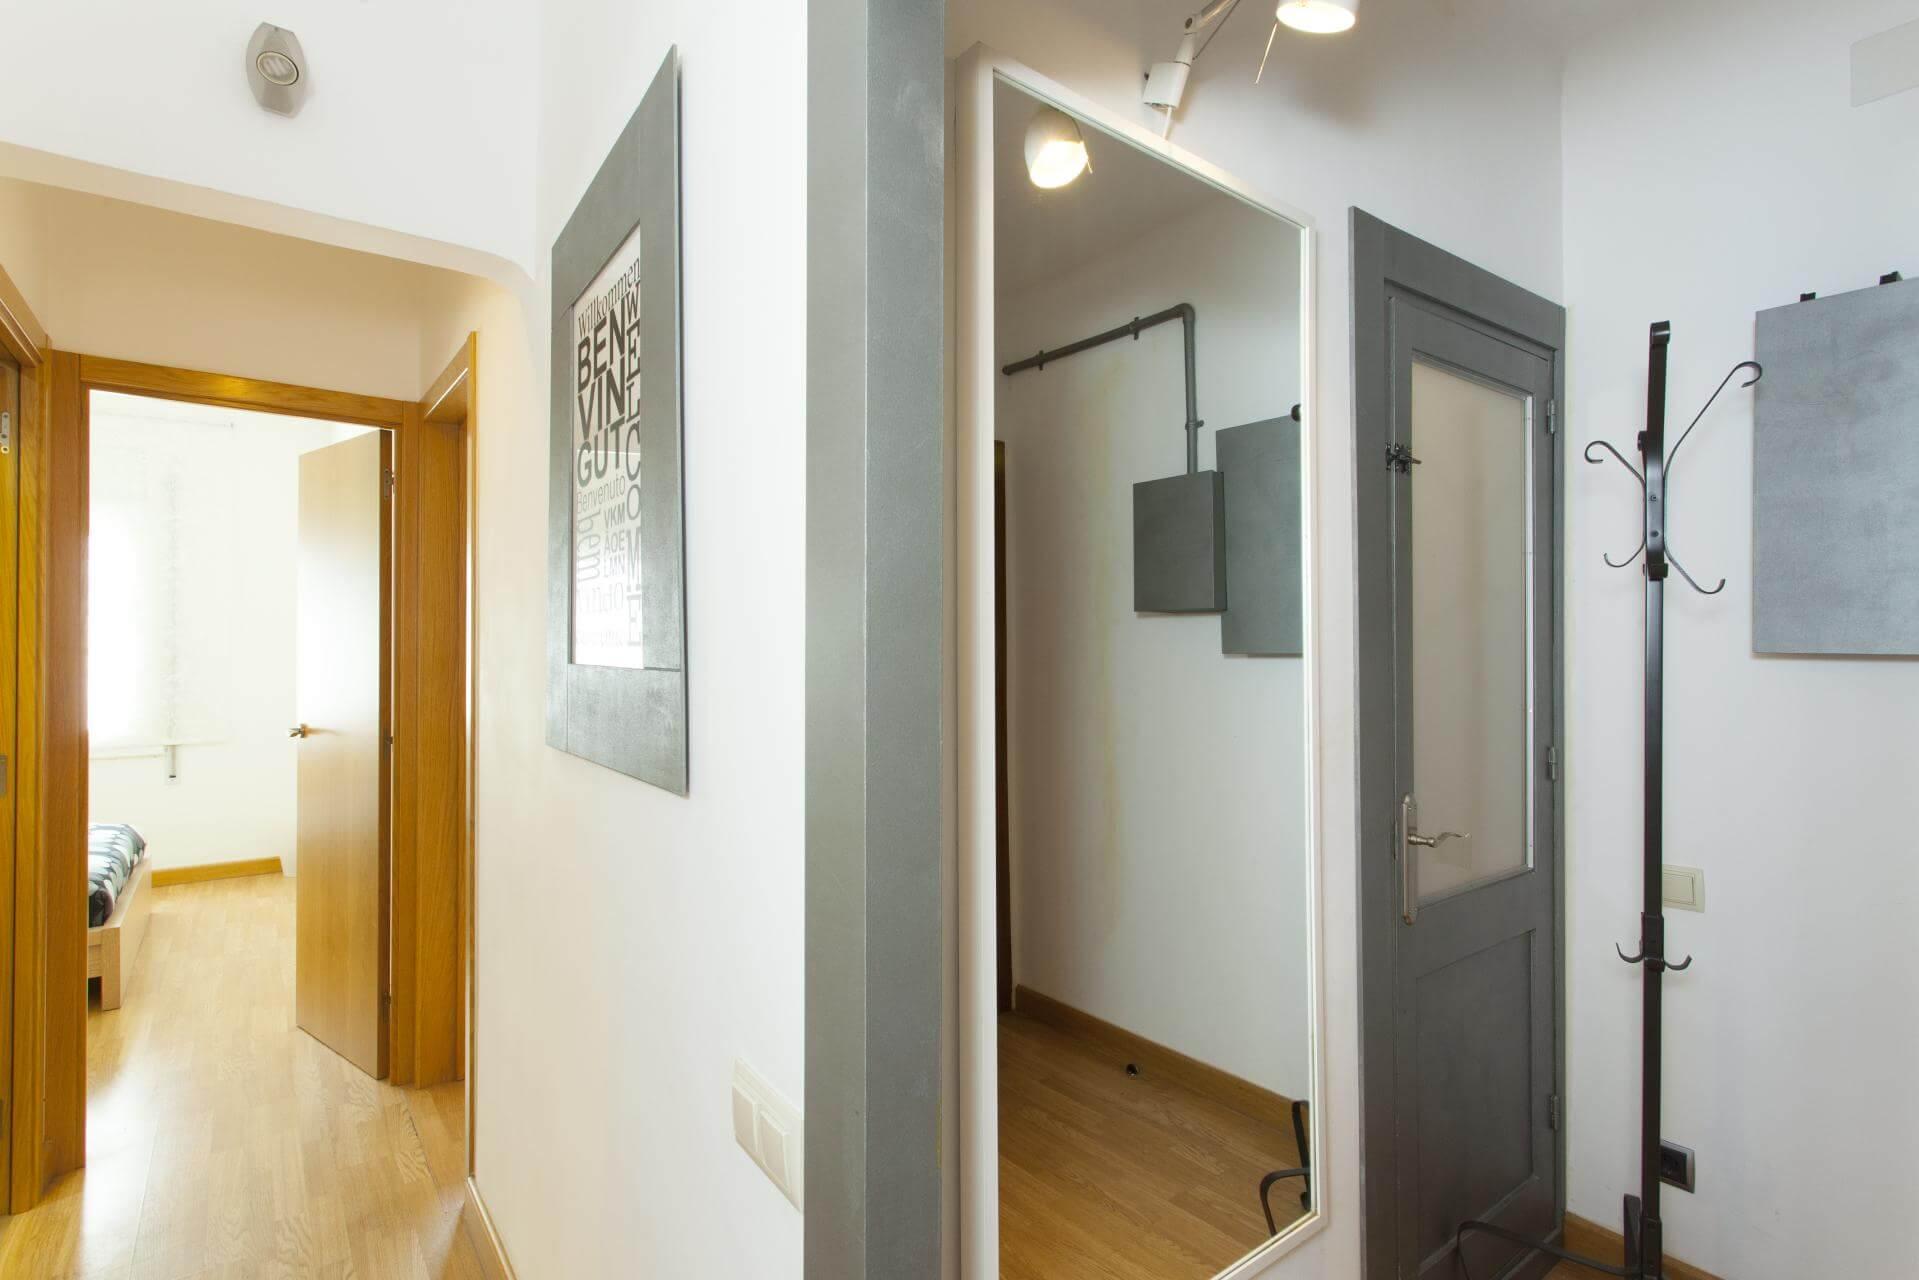 shbarcelona appartement louer sants montju c barcelone. Black Bedroom Furniture Sets. Home Design Ideas